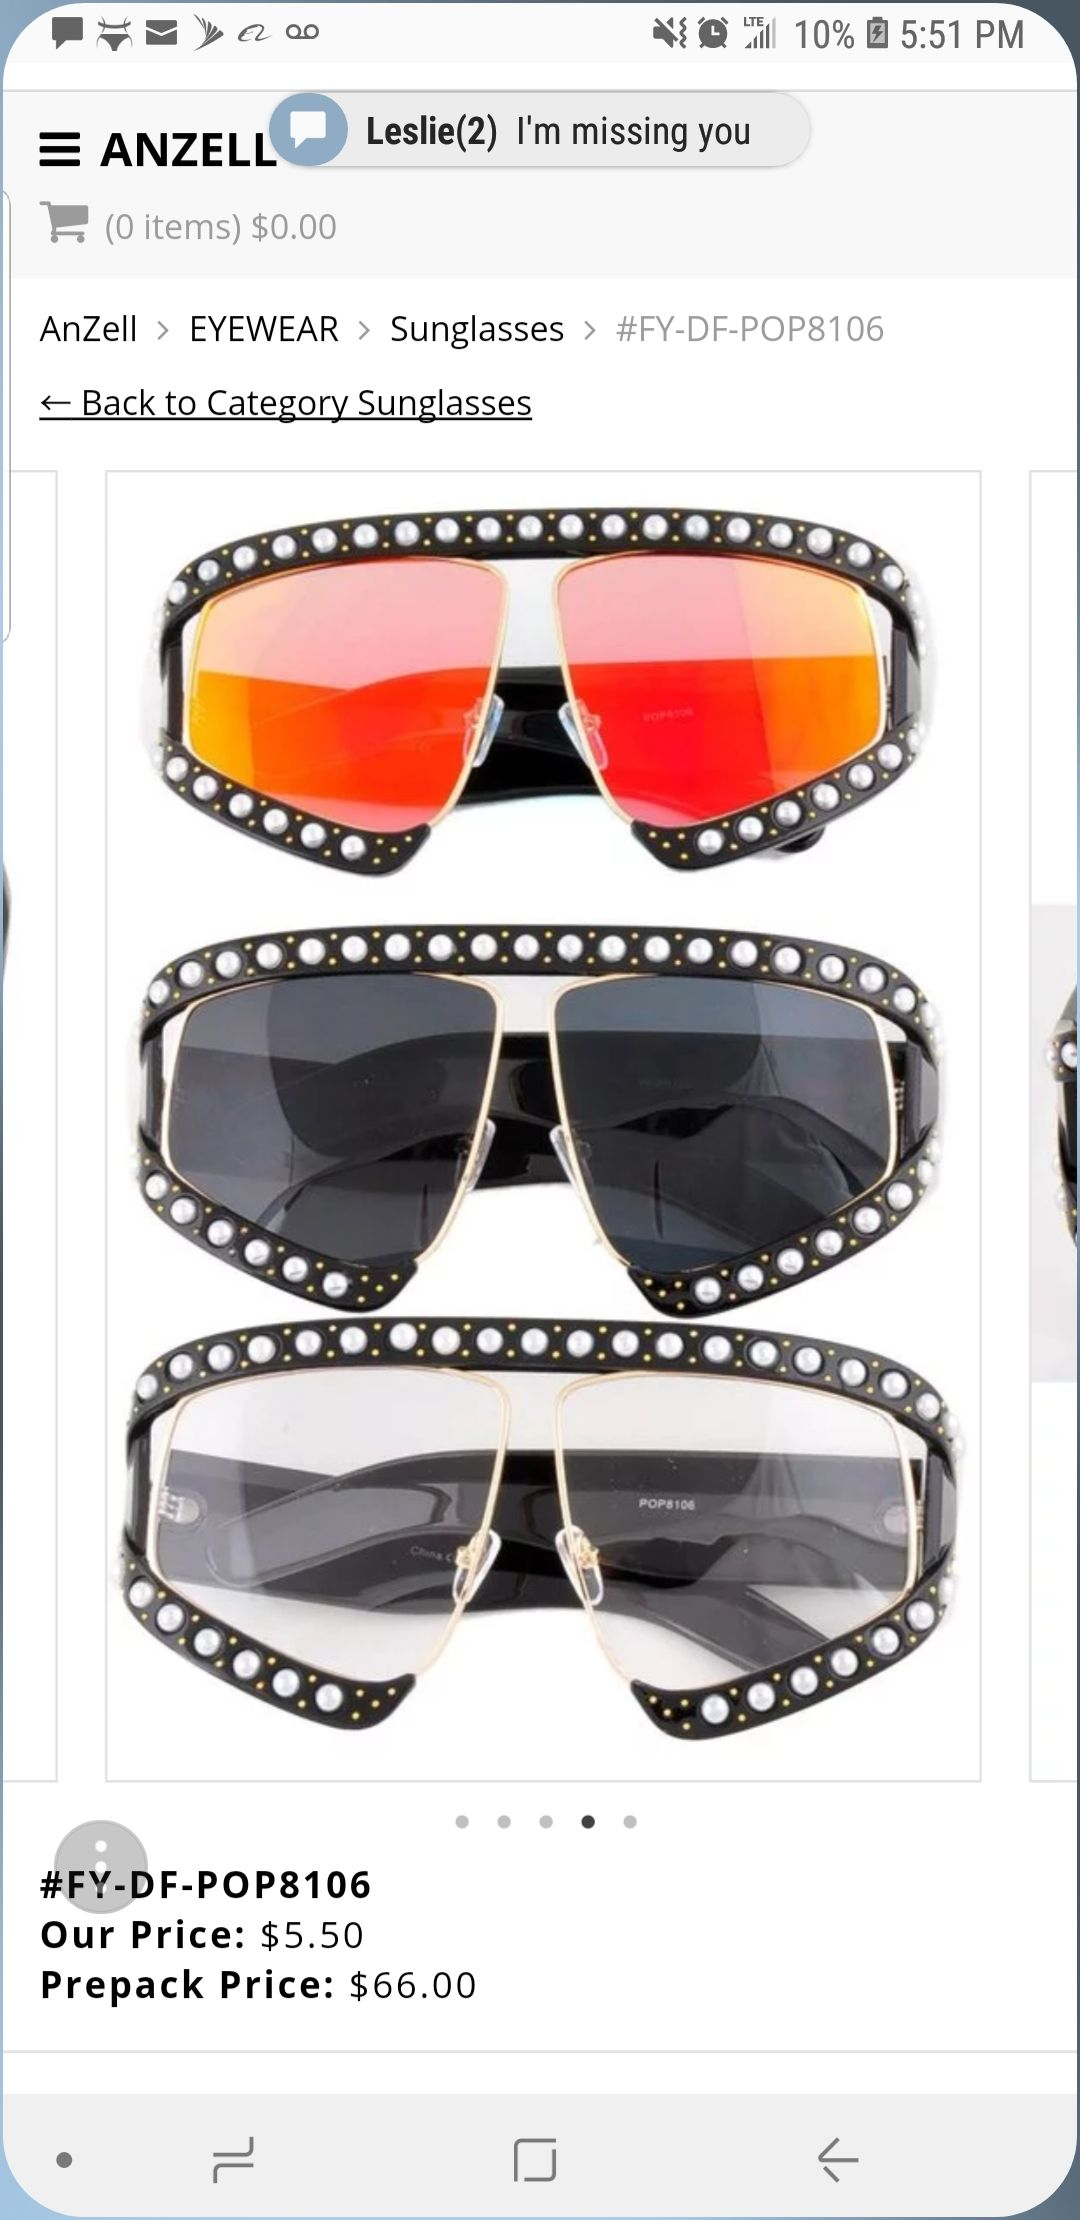 447528bfb7cae Rectangular-Frame Acetate Sunglasses With Pearls